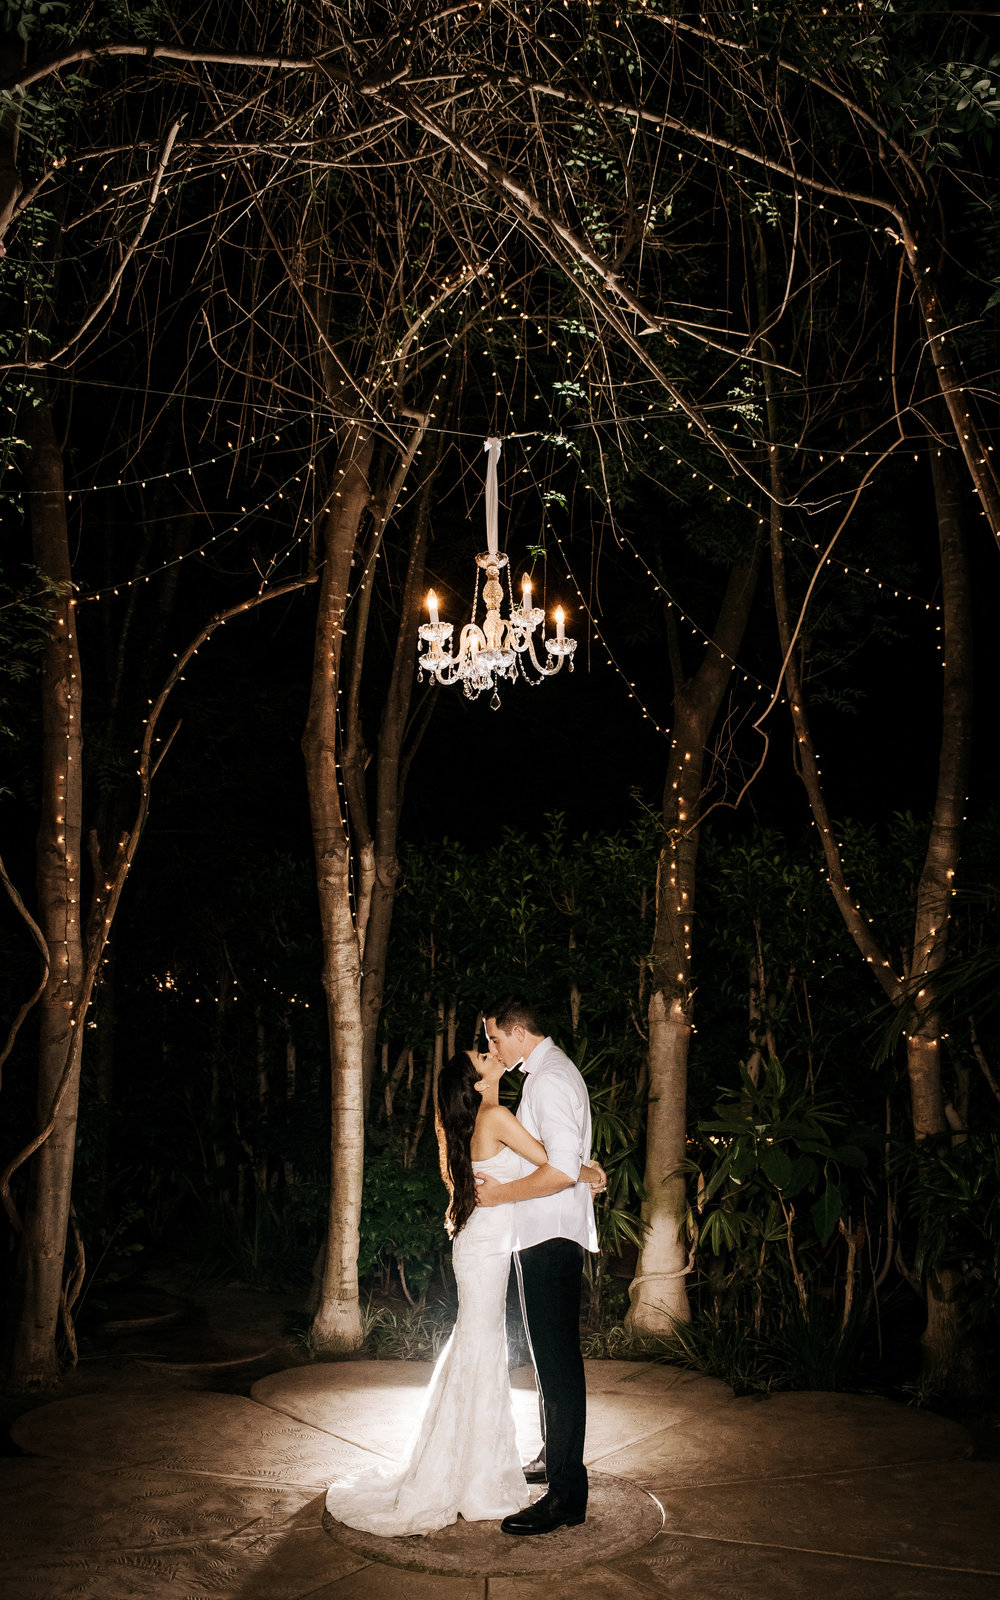 Turchin_20180825_Austinae-Brent-Wedding_741.jpg